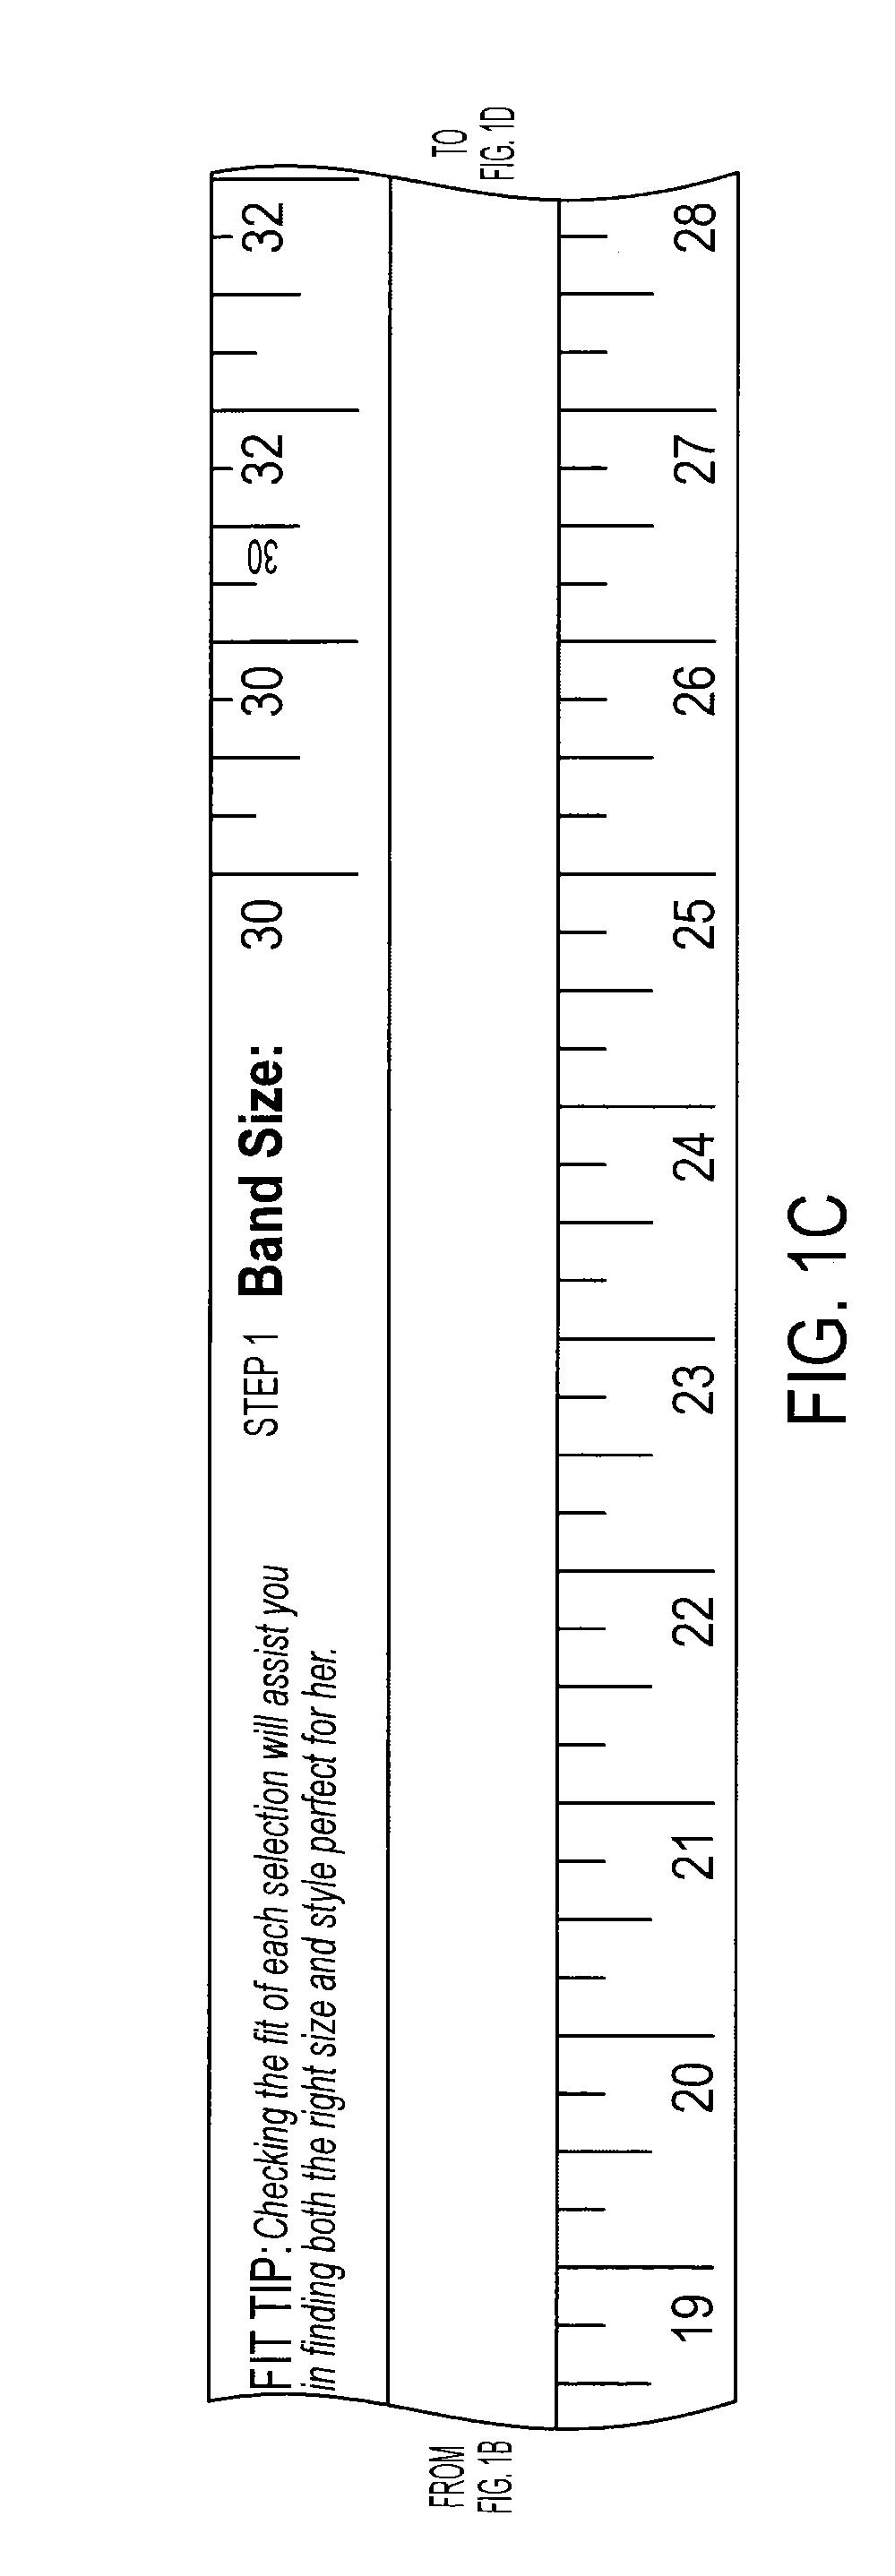 patent us20130074353 bra size measuring tape google patents. Black Bedroom Furniture Sets. Home Design Ideas